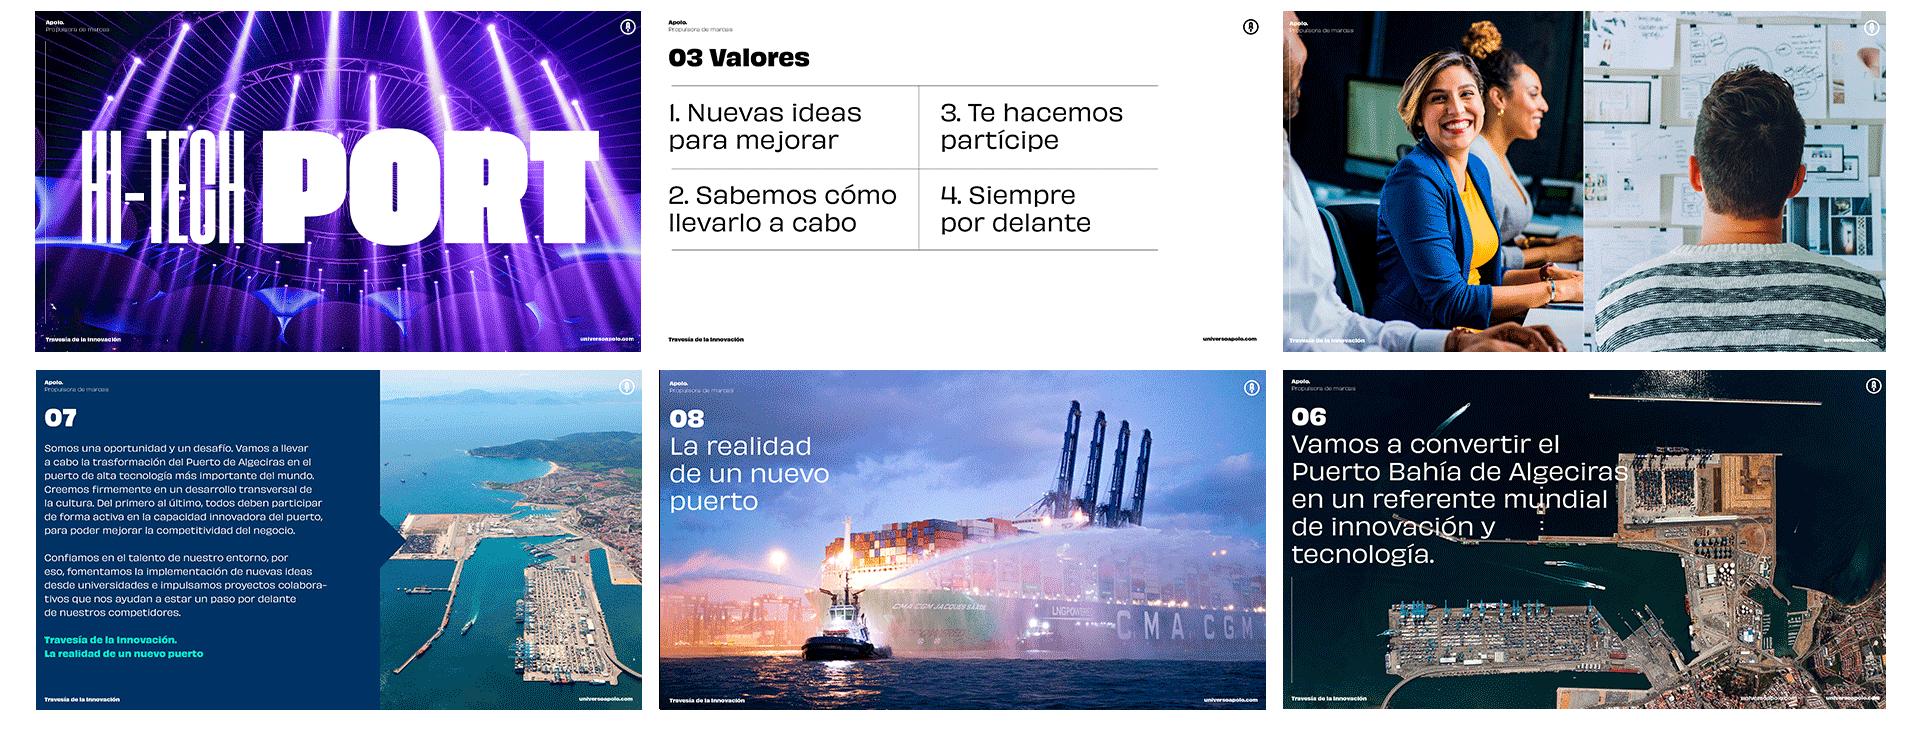 Estrategia-marca-Puerto-Algeciras-Travesia-innovacion